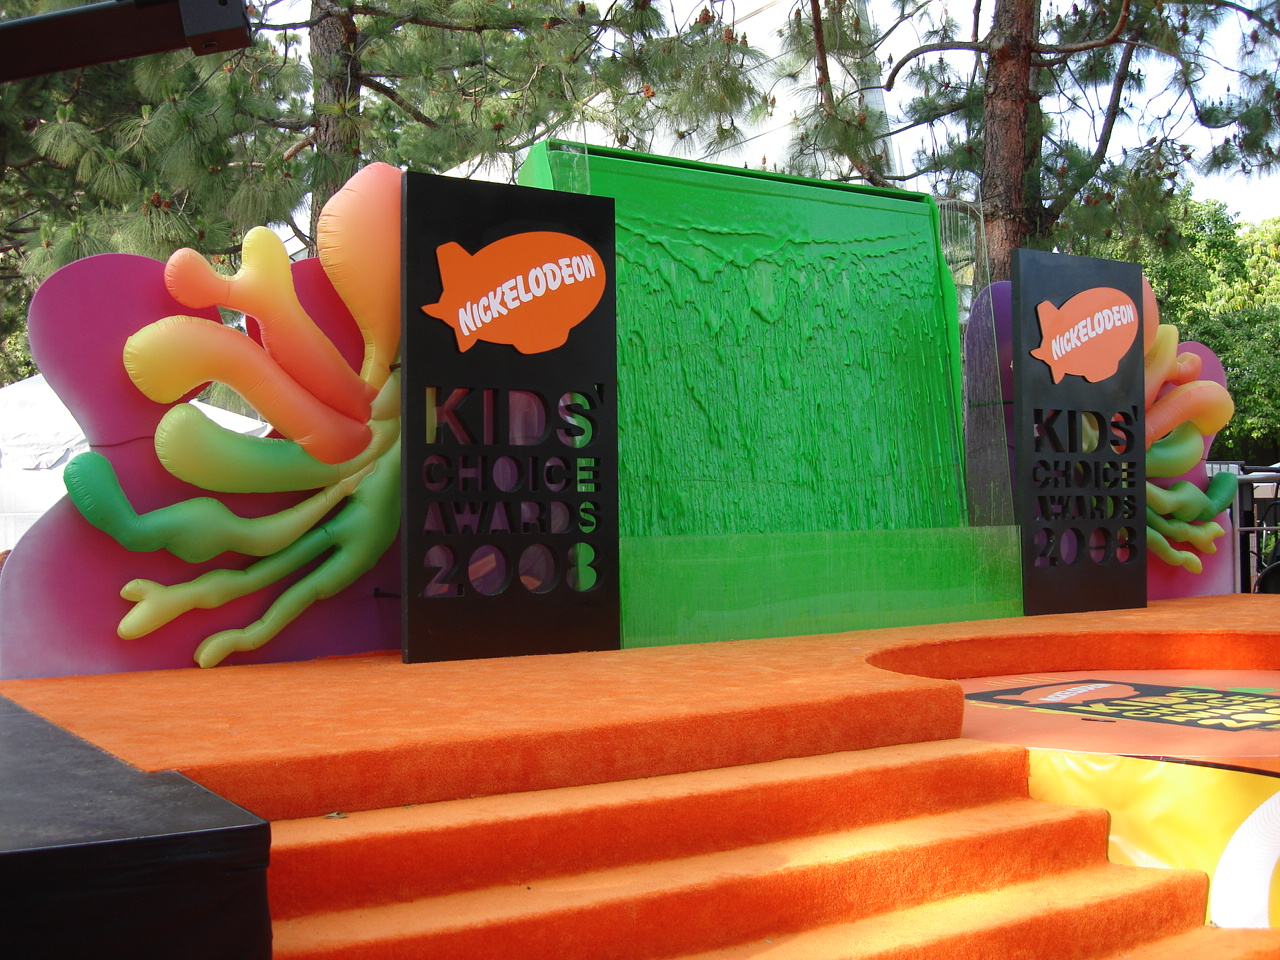 Kids Choice Awards 2008 Slime Wall